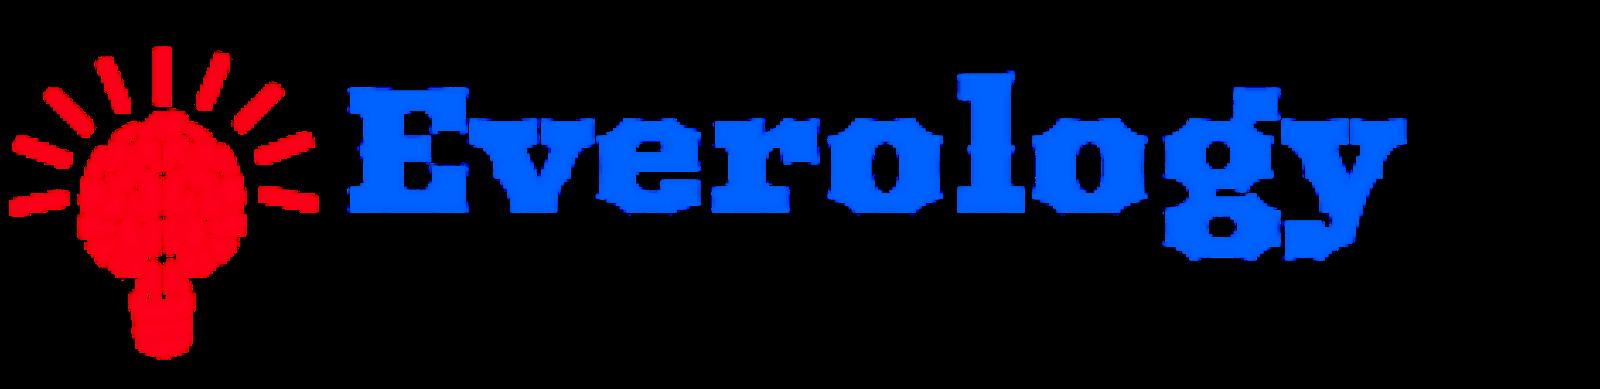 Everology